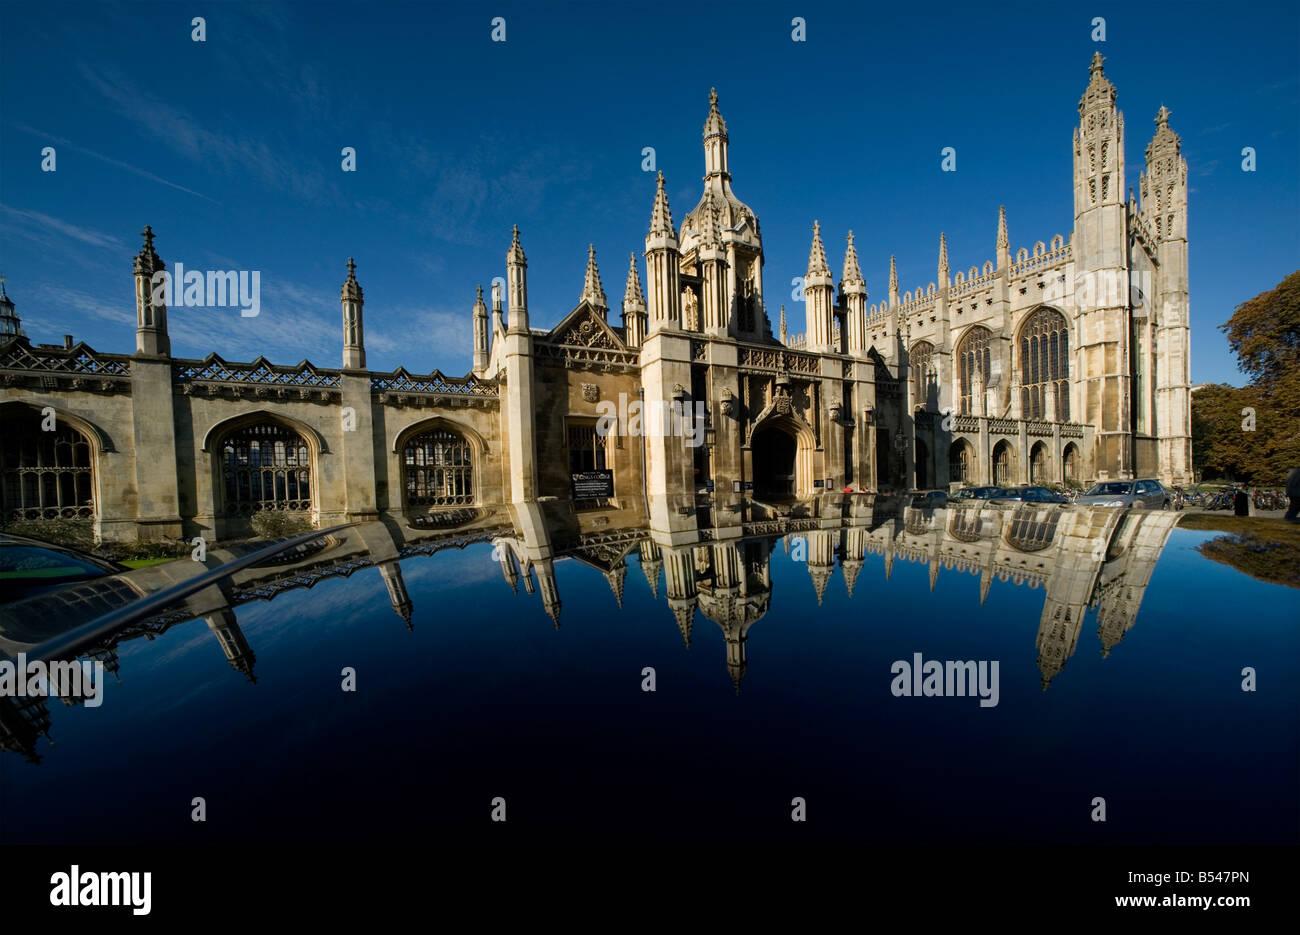 Cambridge University Kings College Cambridge Britain  2008 - Stock Image